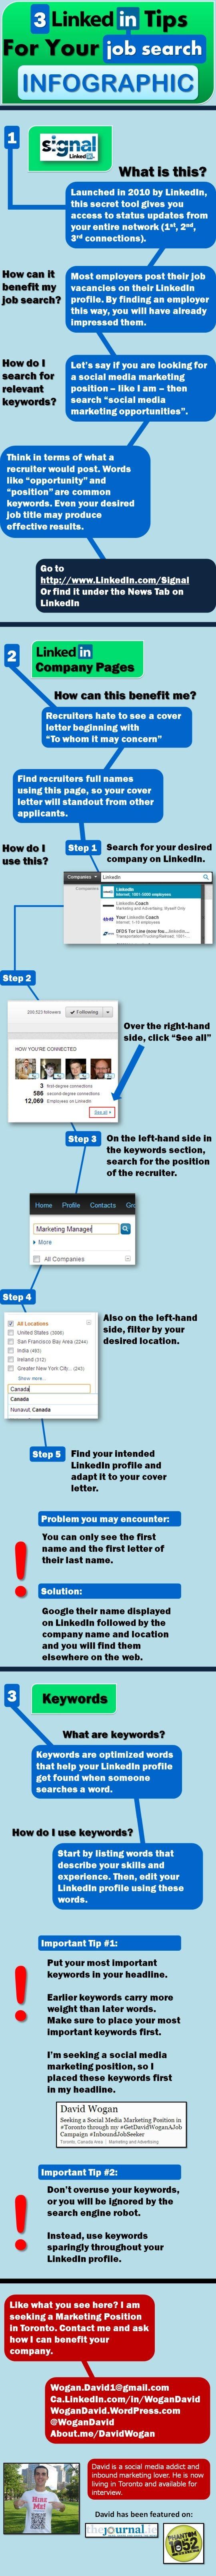 Linkedin tips for your job search #infographic #socialmedia